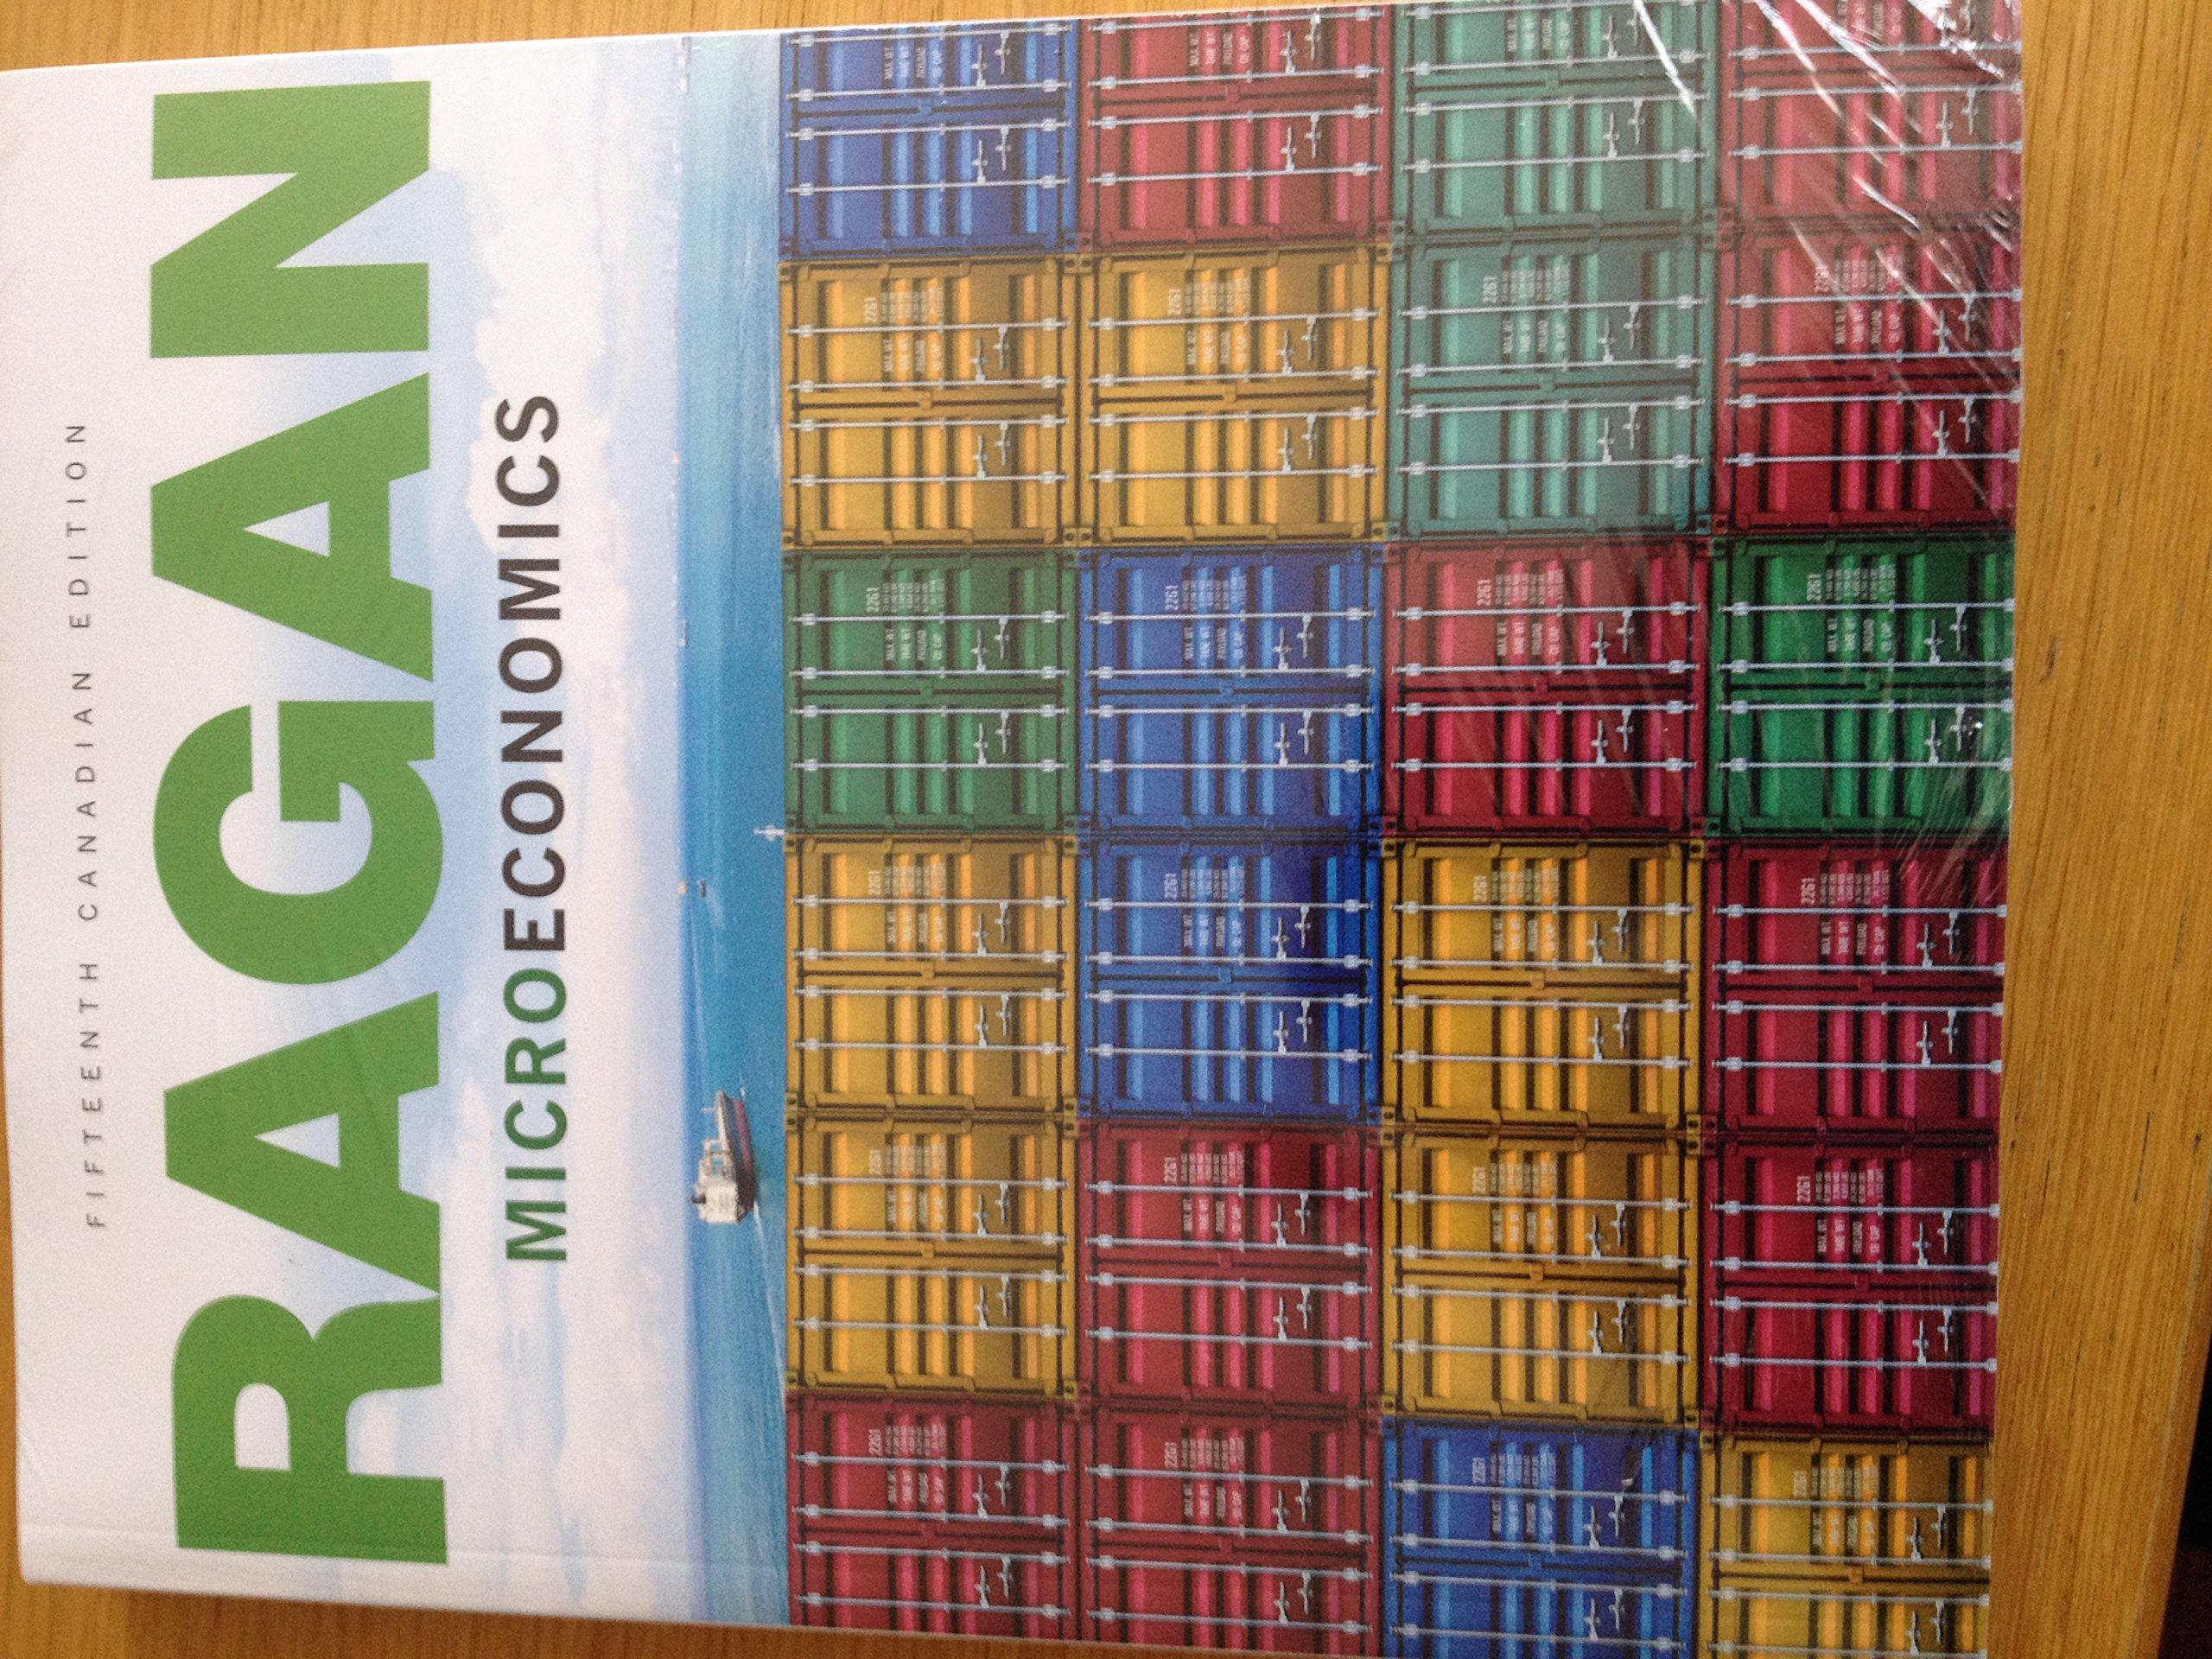 Microeconomics fifteenth canadian edition 15th edition microeconomics fifteenth canadian edition 15th edition christopher ts ragan 9780133910438 economics amazon canada fandeluxe Choice Image